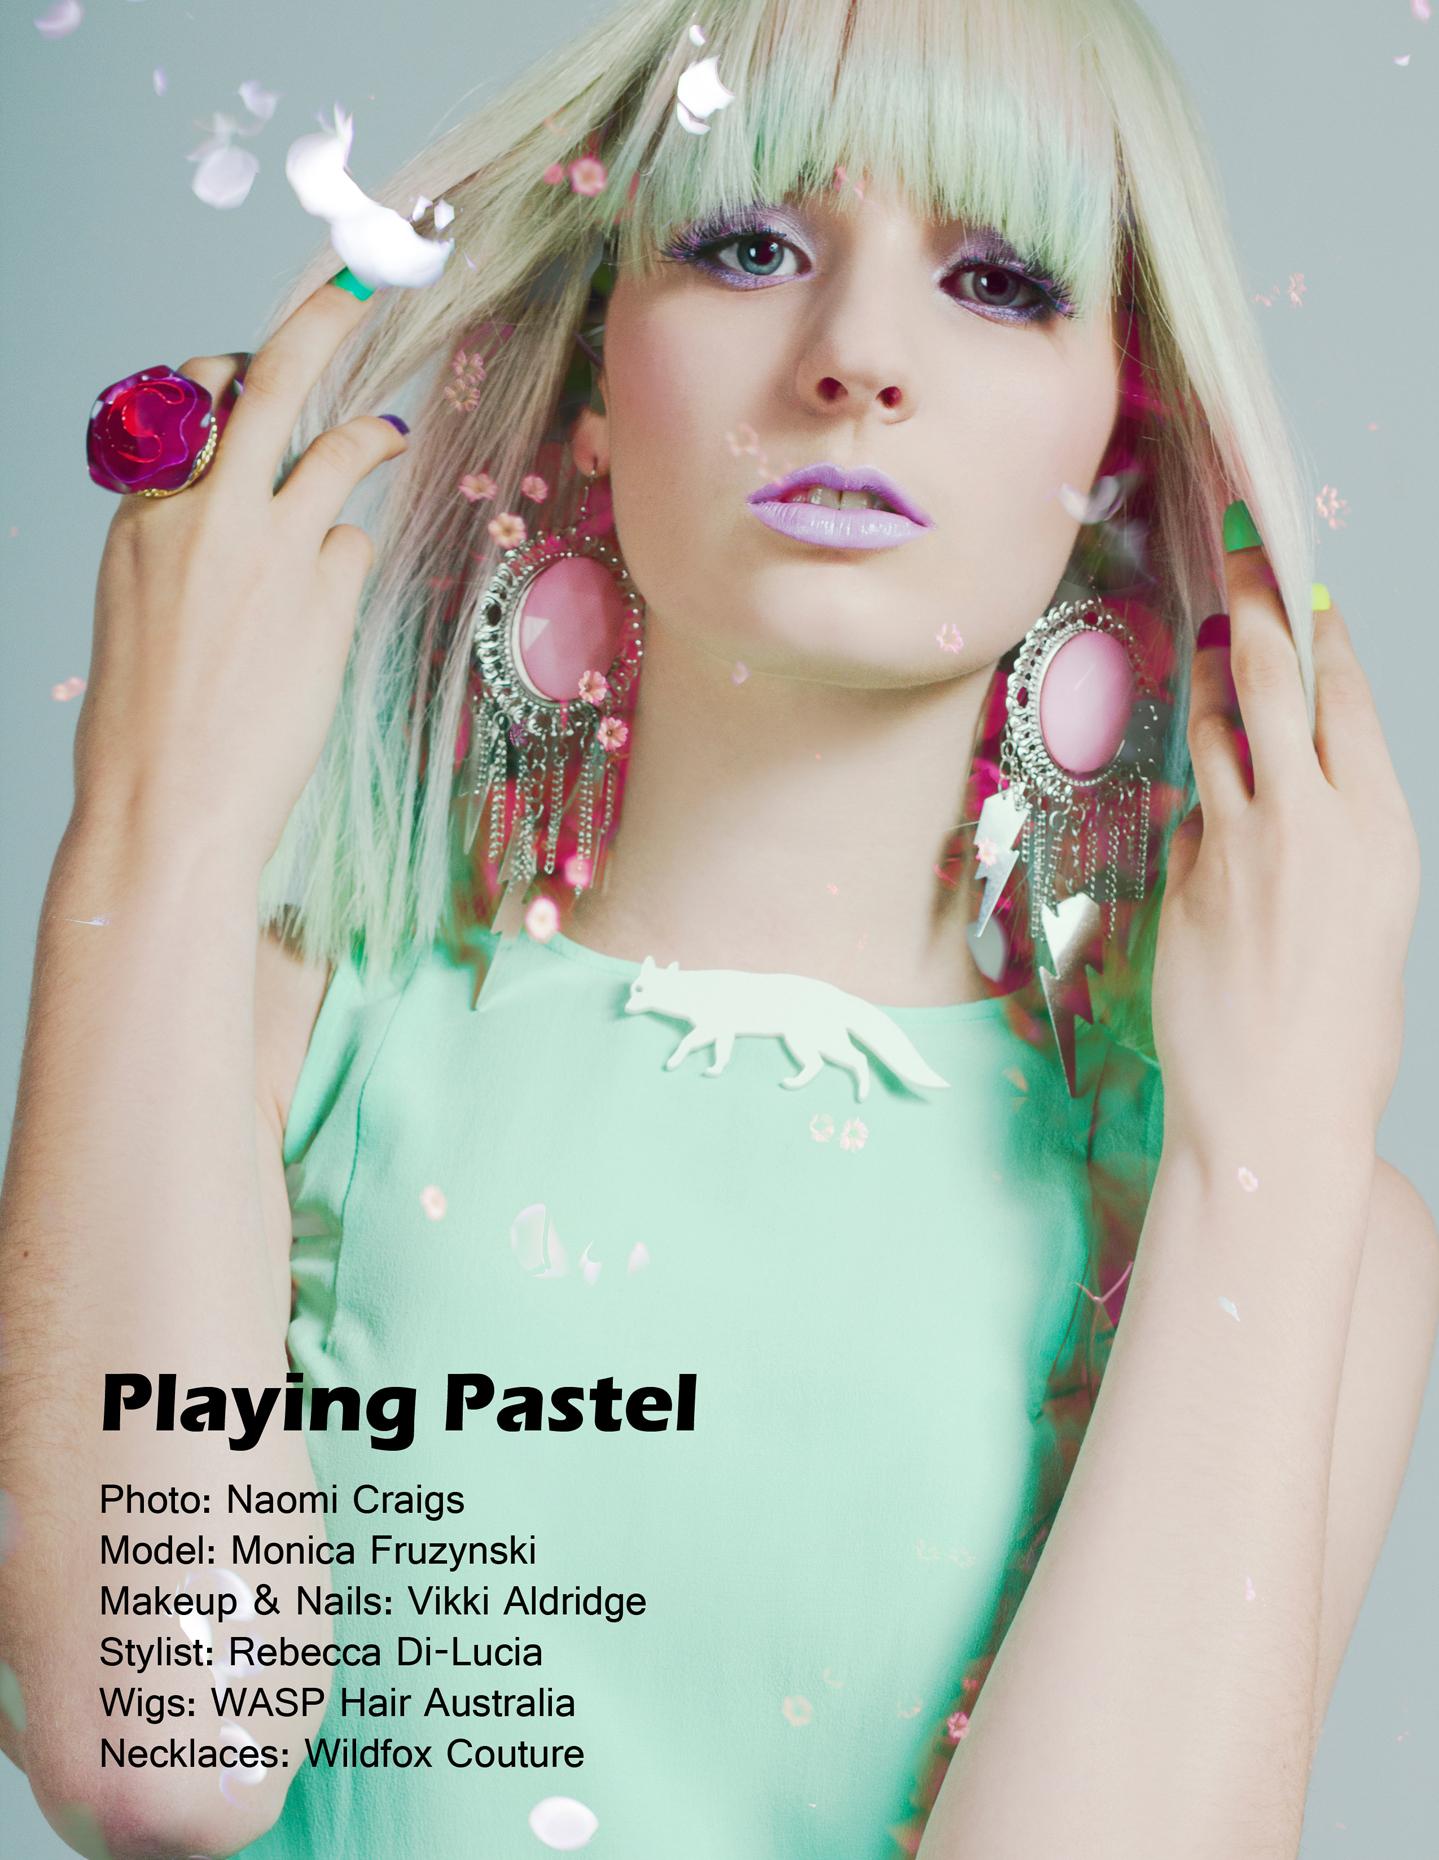 Makeup, hair,nails by Vikki Aldridge